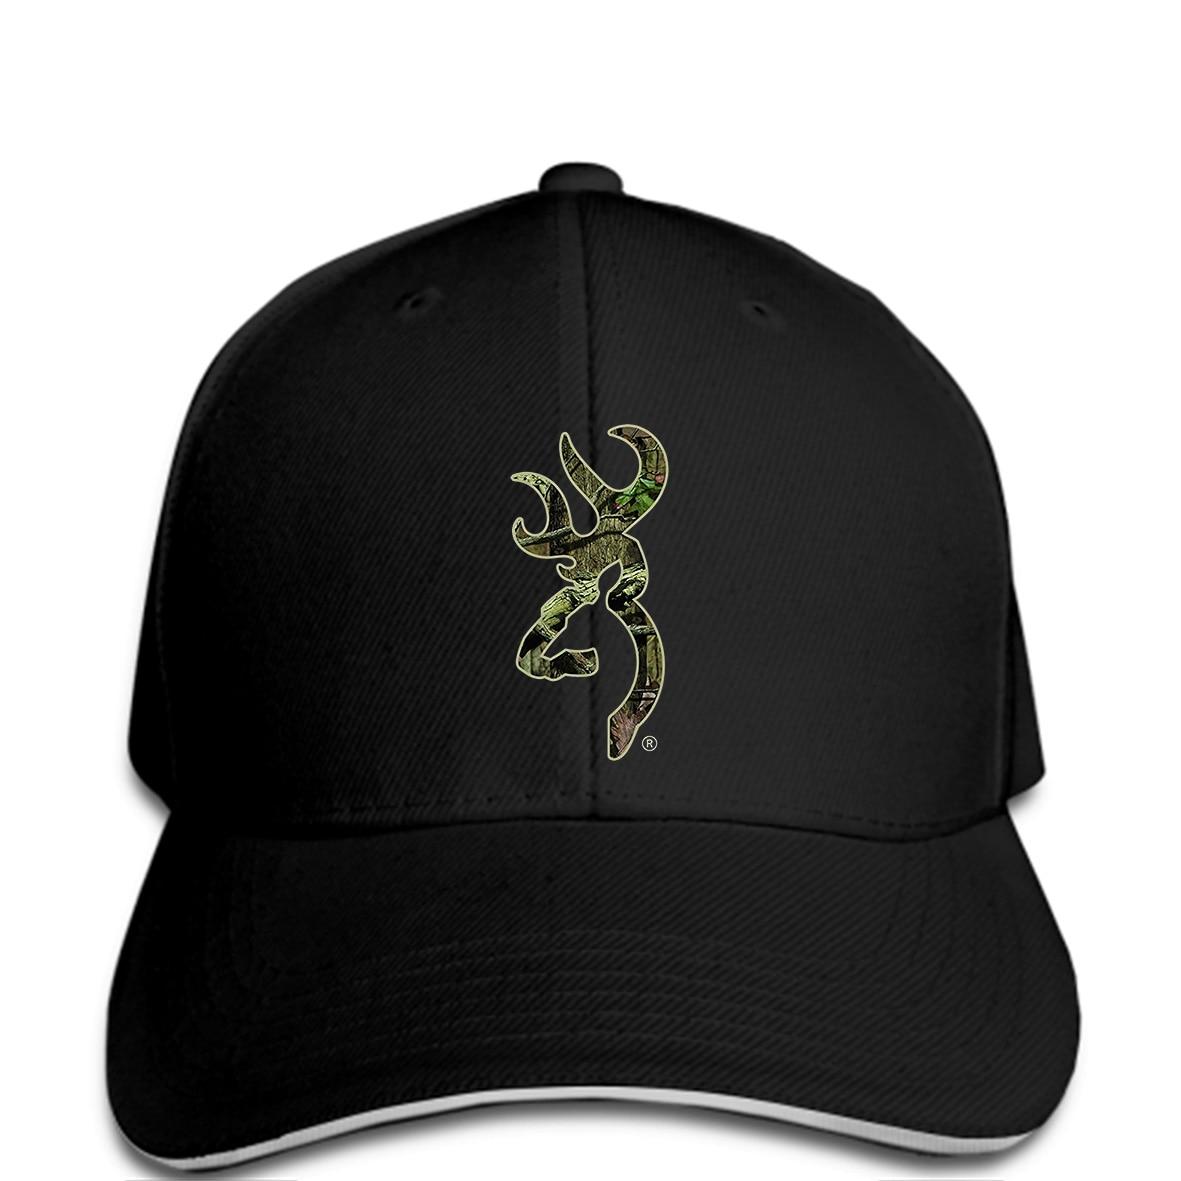 Baseball cap Browning Camo Buckmark Men Hat Funny Black